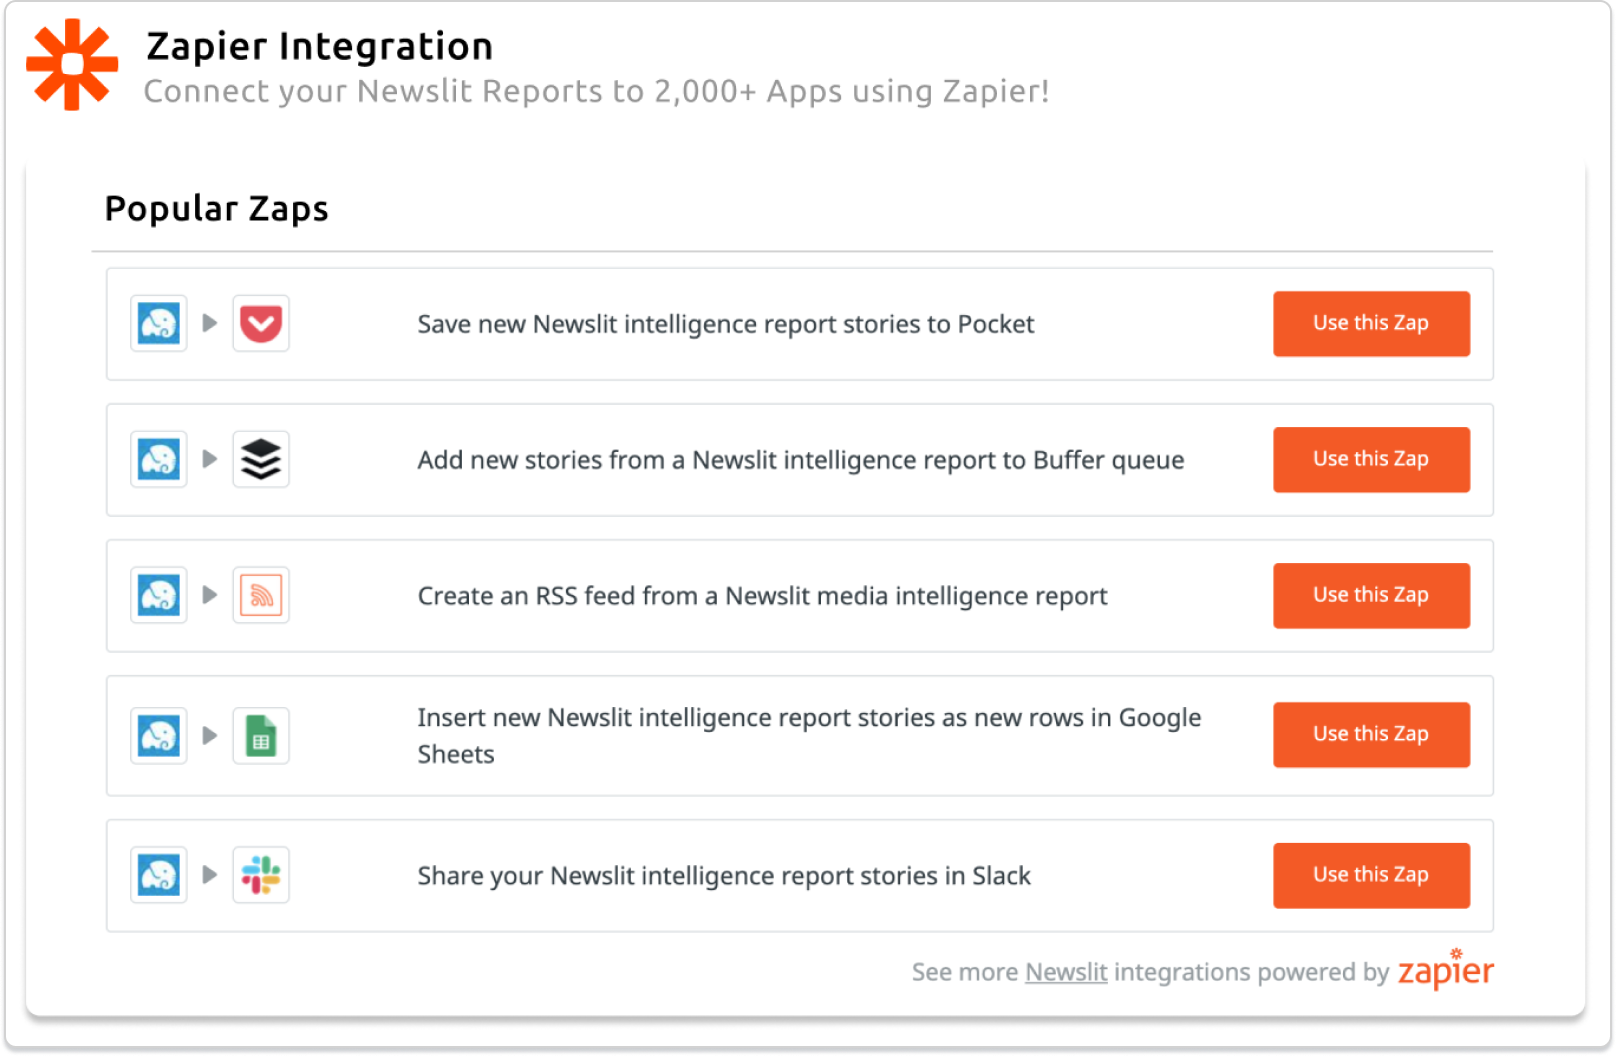 zapier-integration-image